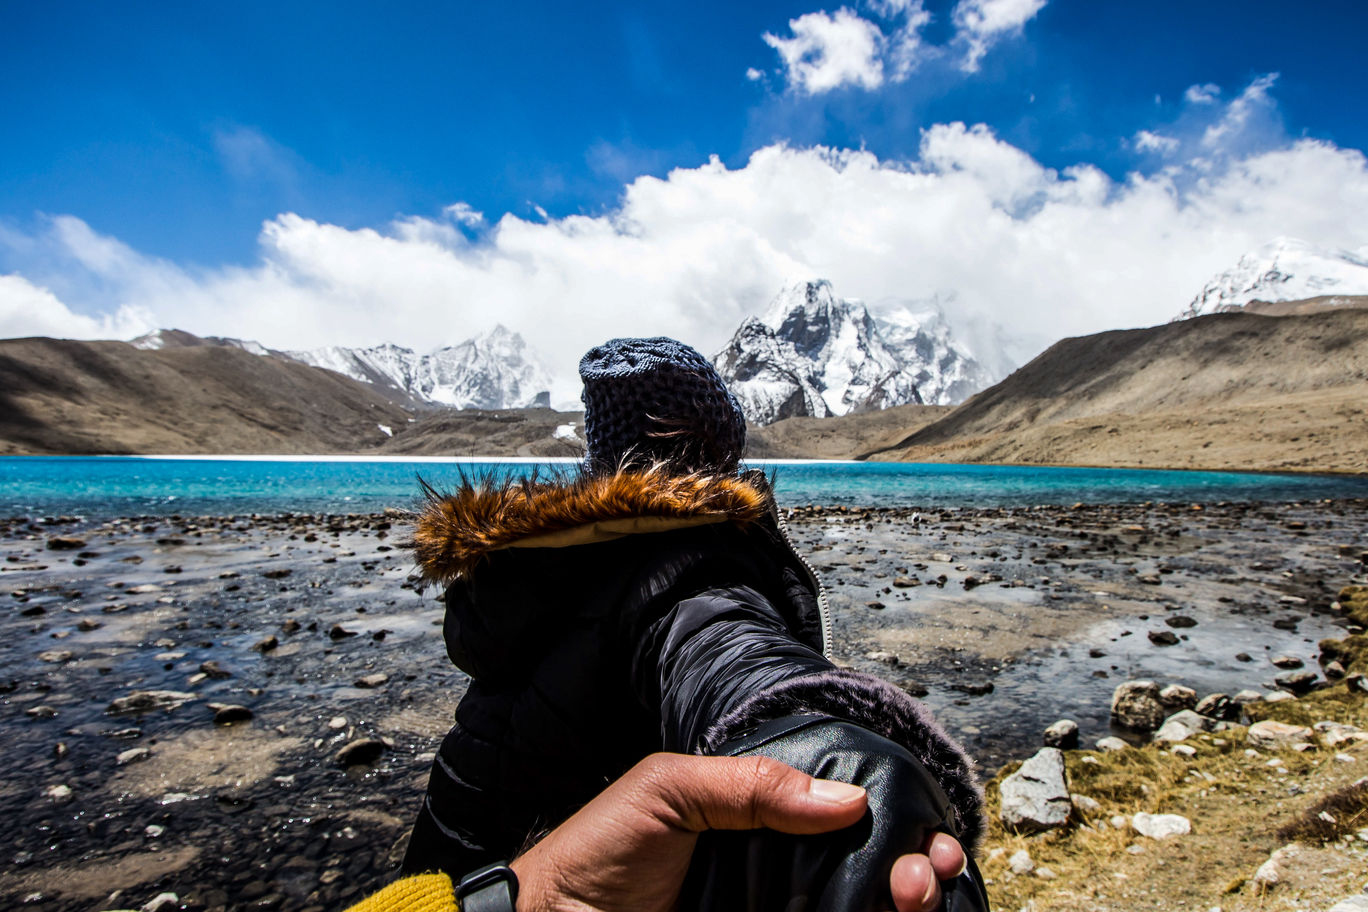 Photo of Sikkim By sandeep adatiya